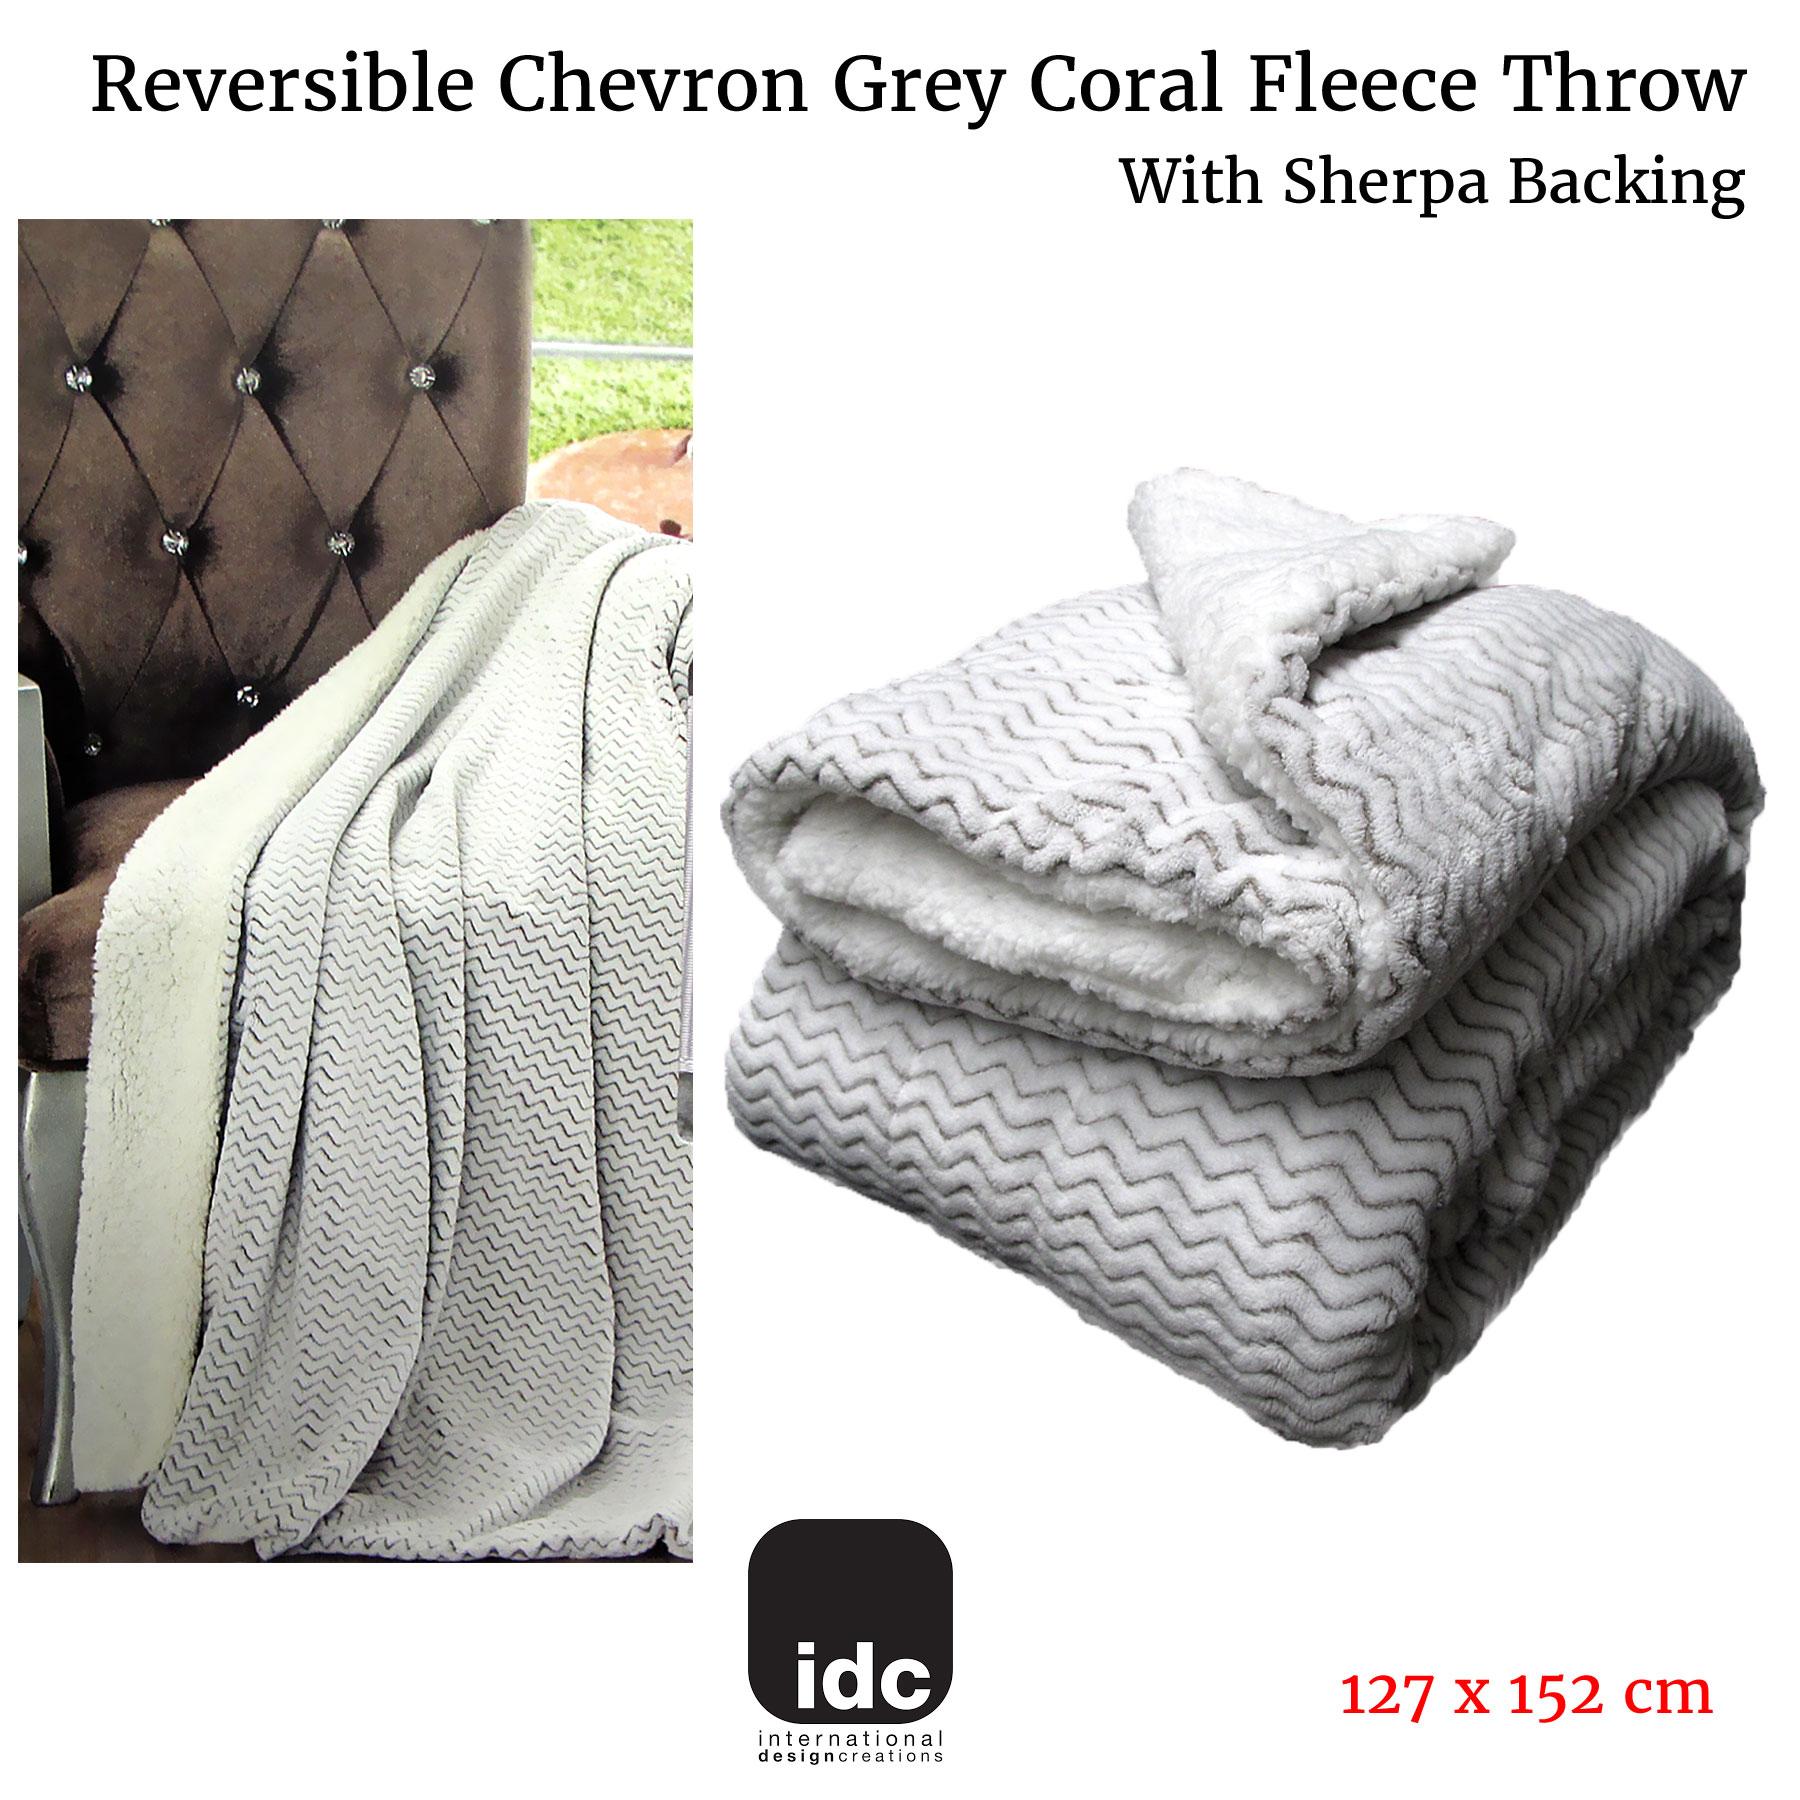 Reversible Chevron Grey Coral Fleece Sofa Lounge Throw with Sherpa Backing